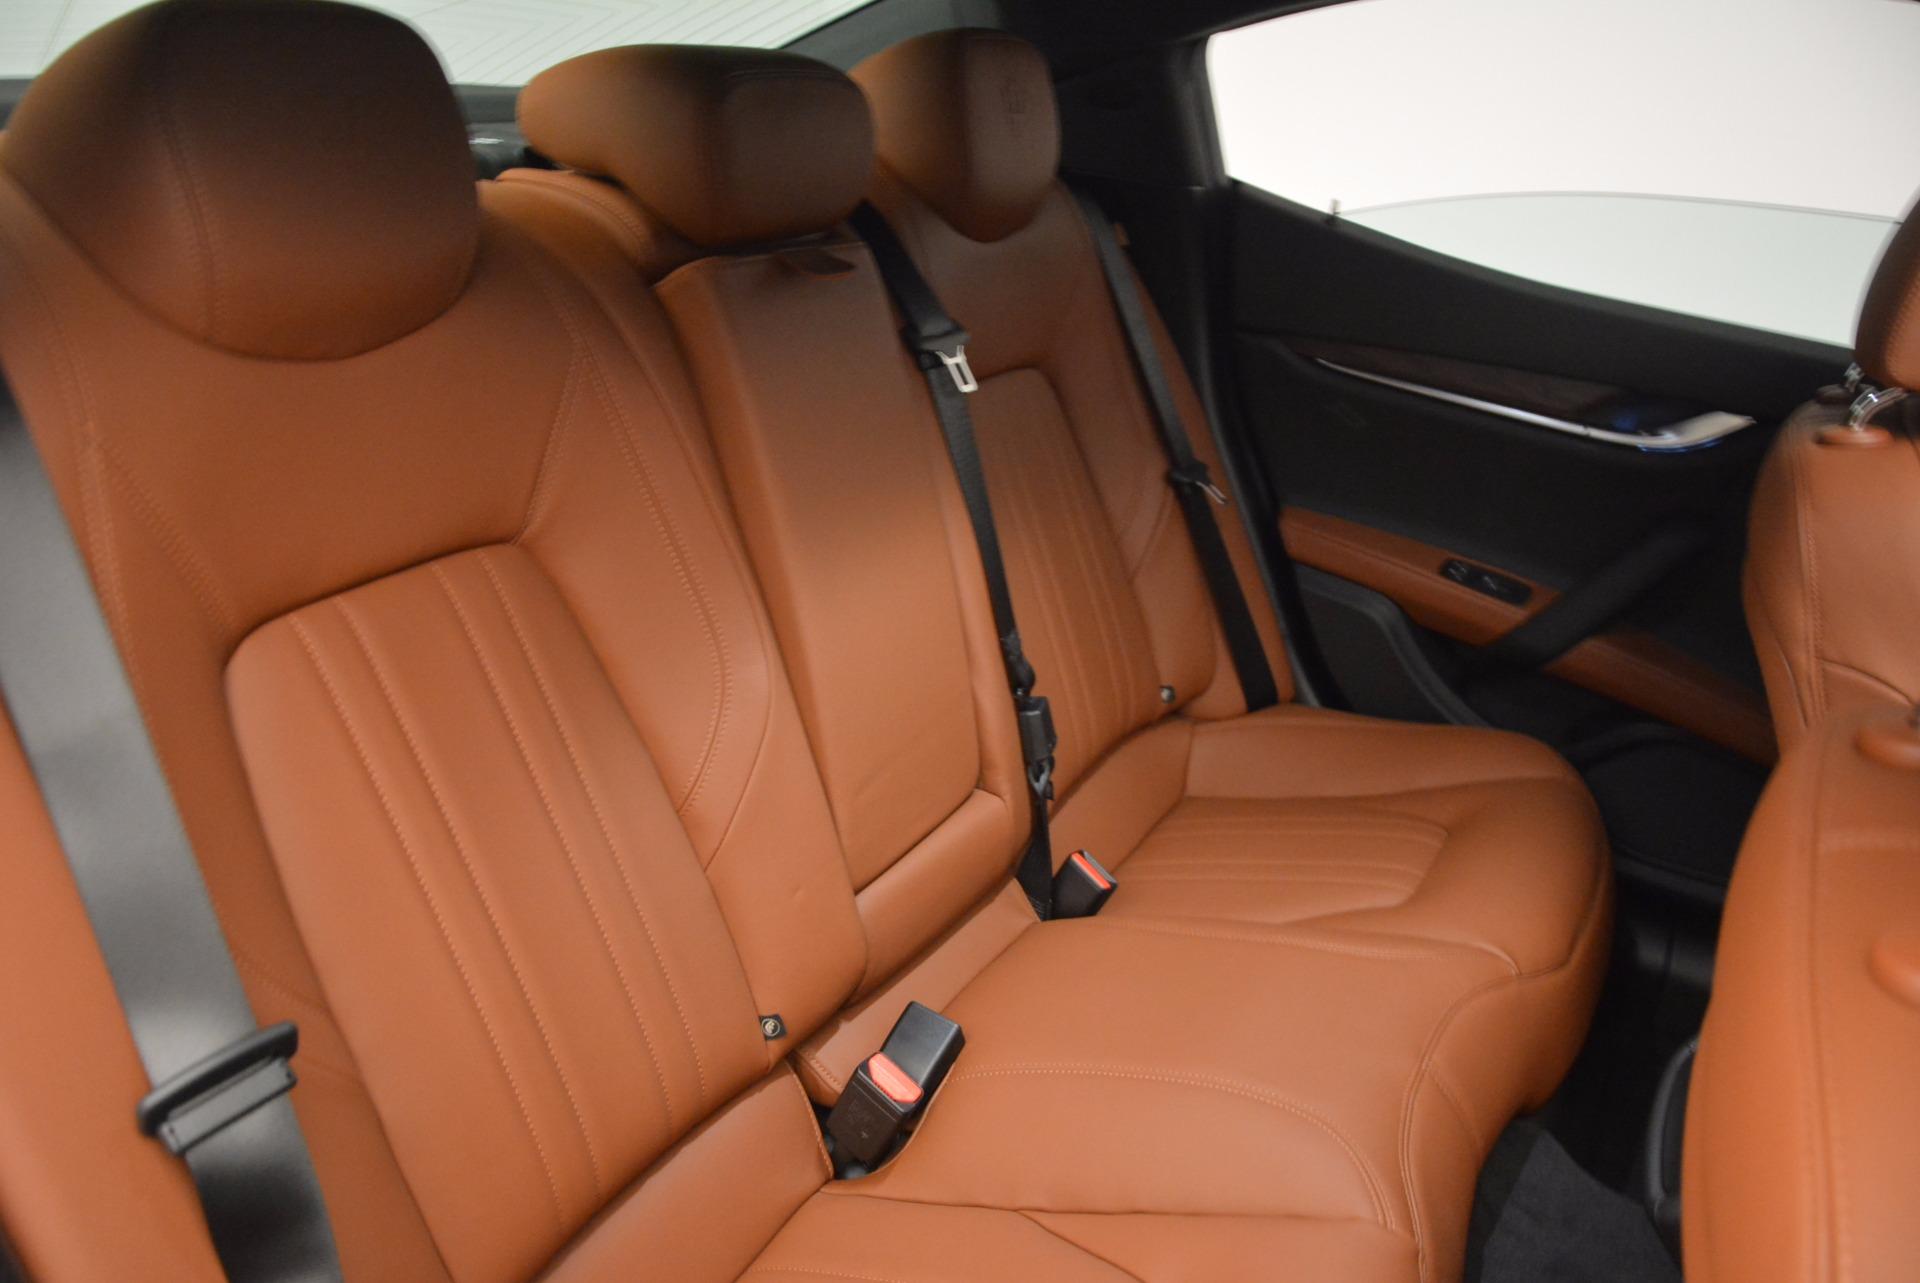 Used 2017 Maserati Ghibli S Q4 Ex-Loaner For Sale In Greenwich, CT 1166_p20